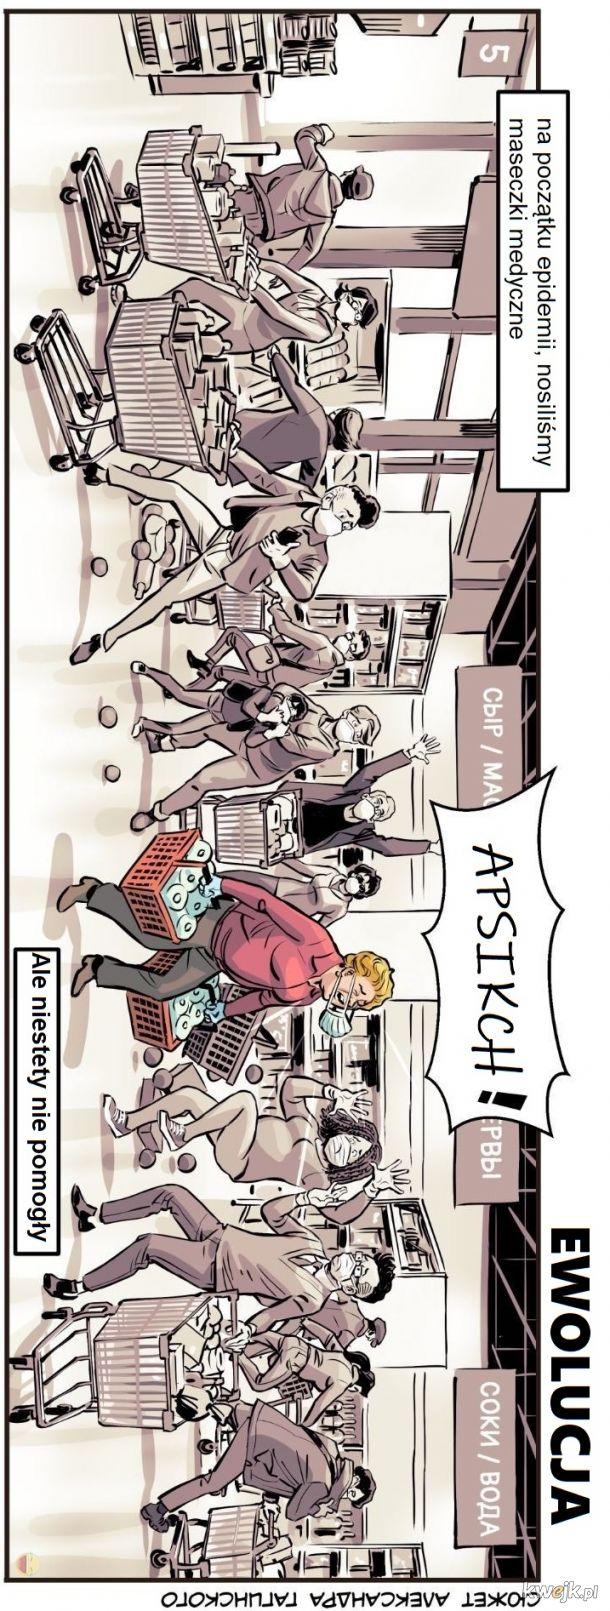 Komiks o pandemii do czytania na telefonach